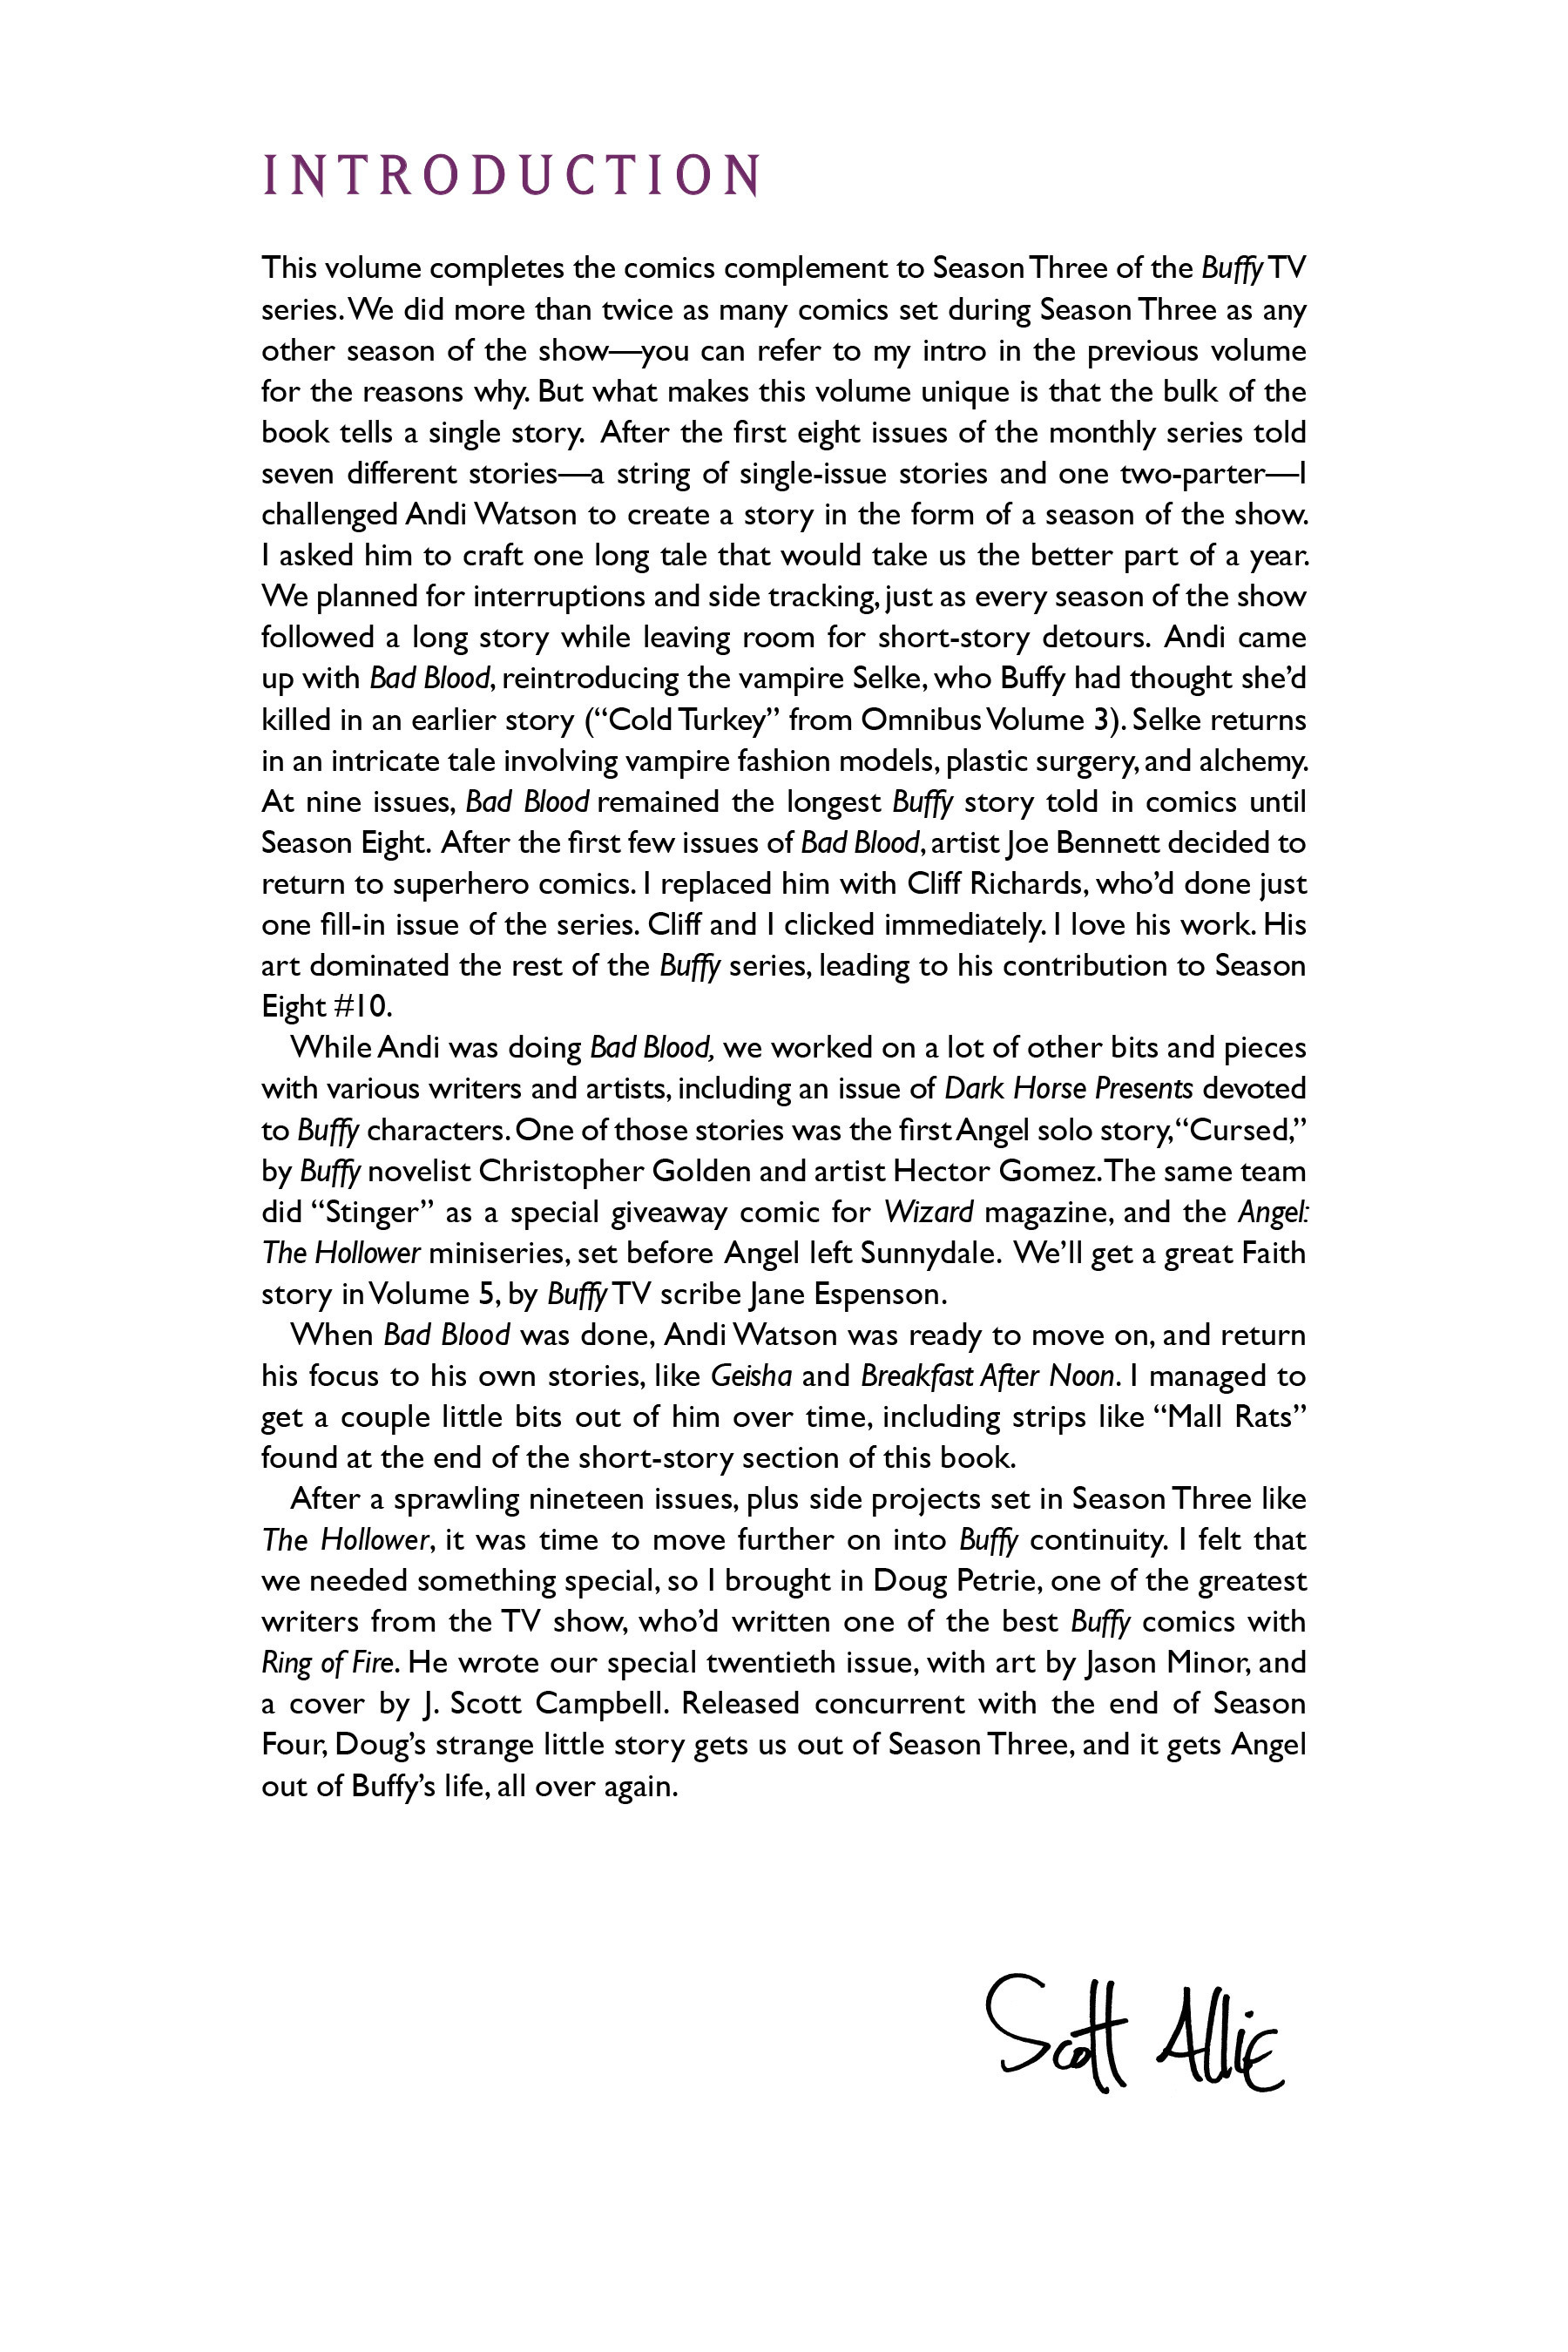 Read online Buffy the Vampire Slayer: Omnibus comic -  Issue # TPB 4 - 6